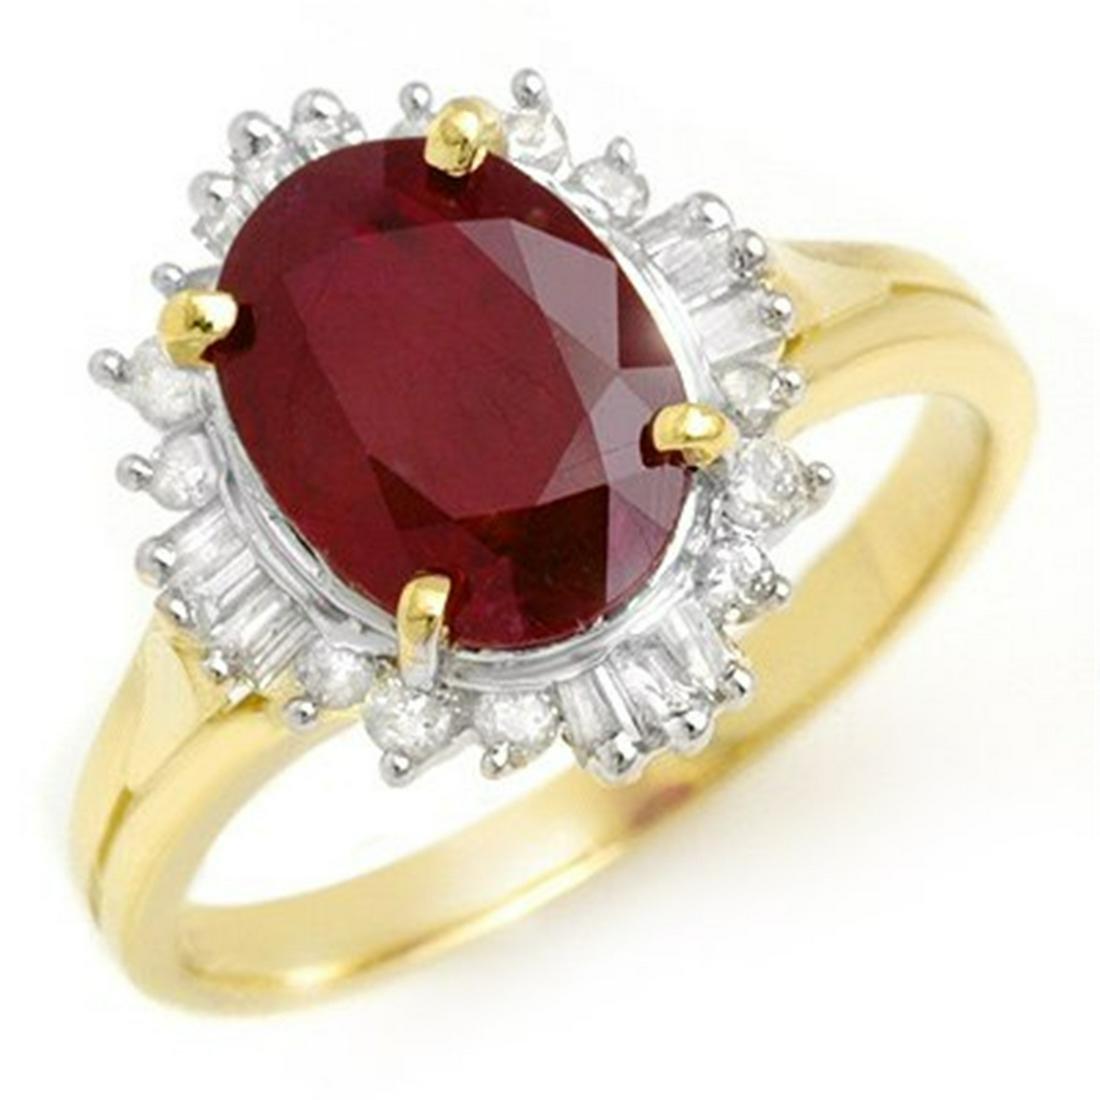 Genuine 3.66 ctw Ruby & Diamond Ring 14K Yellow Gold